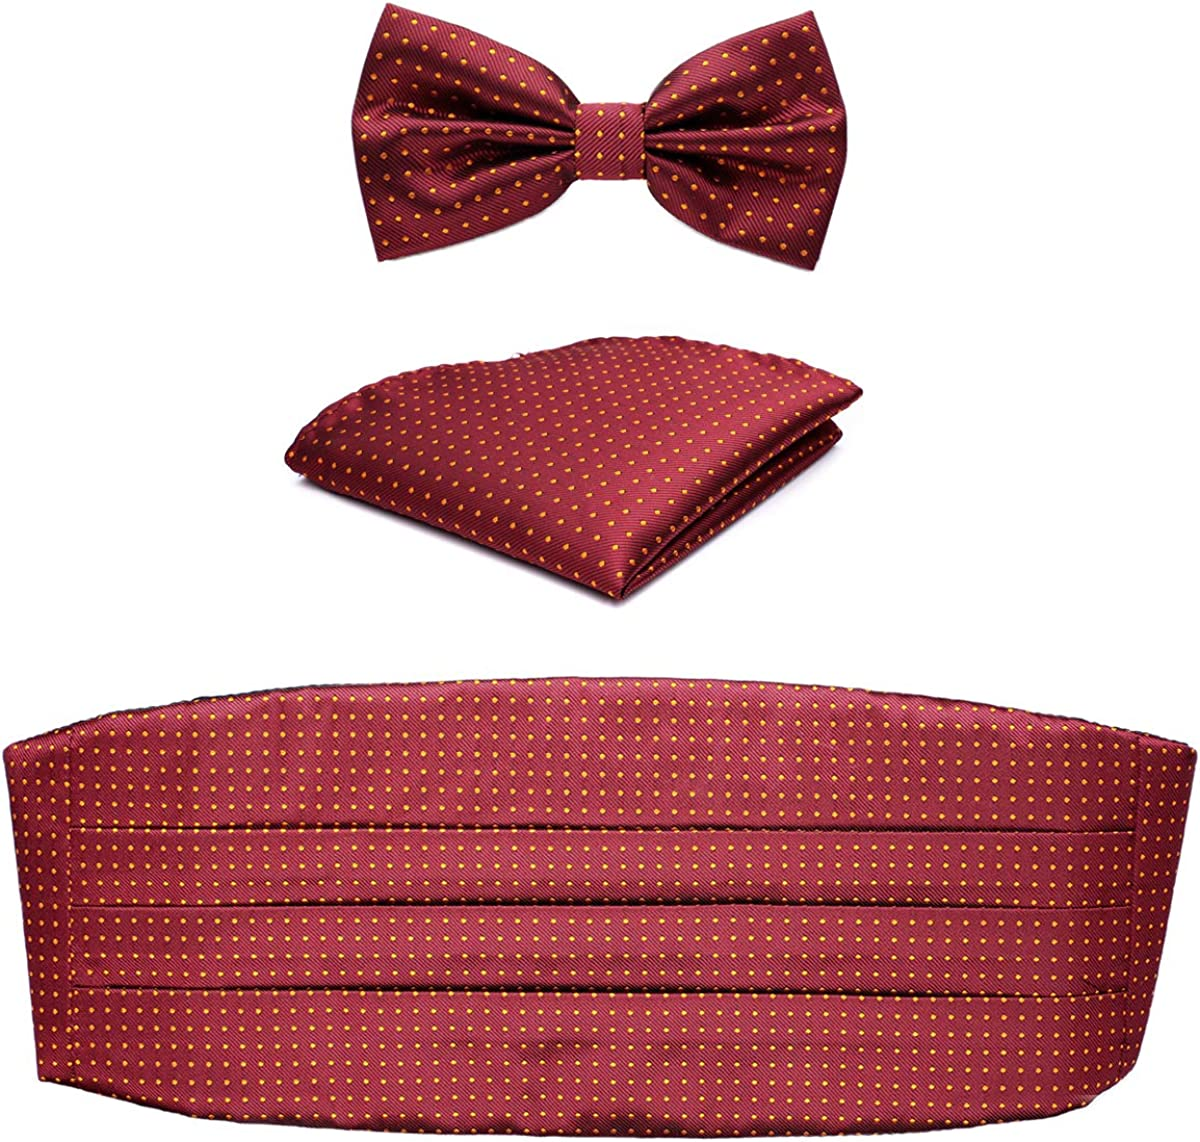 Men's Satin Brocade Polka Dots Adjustable Cummerbund & Bowtie & Pocket Square Tie Set